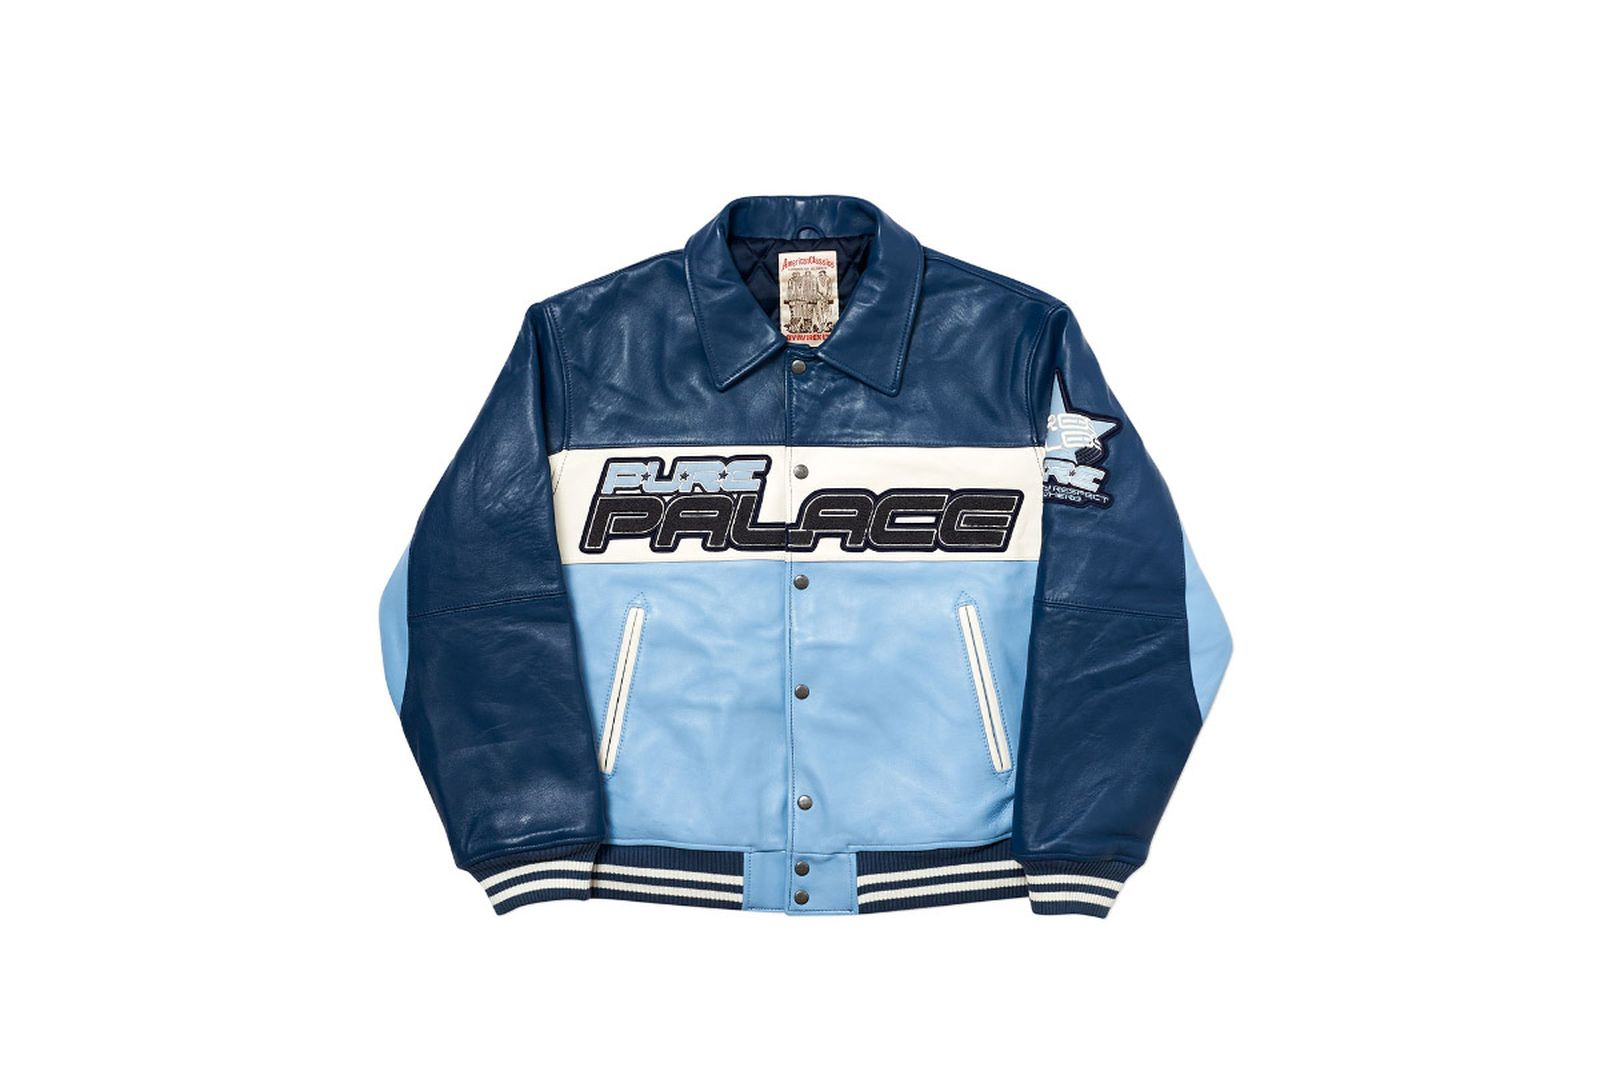 Palace 2019 Autumn Jacket Avirex blue fw19